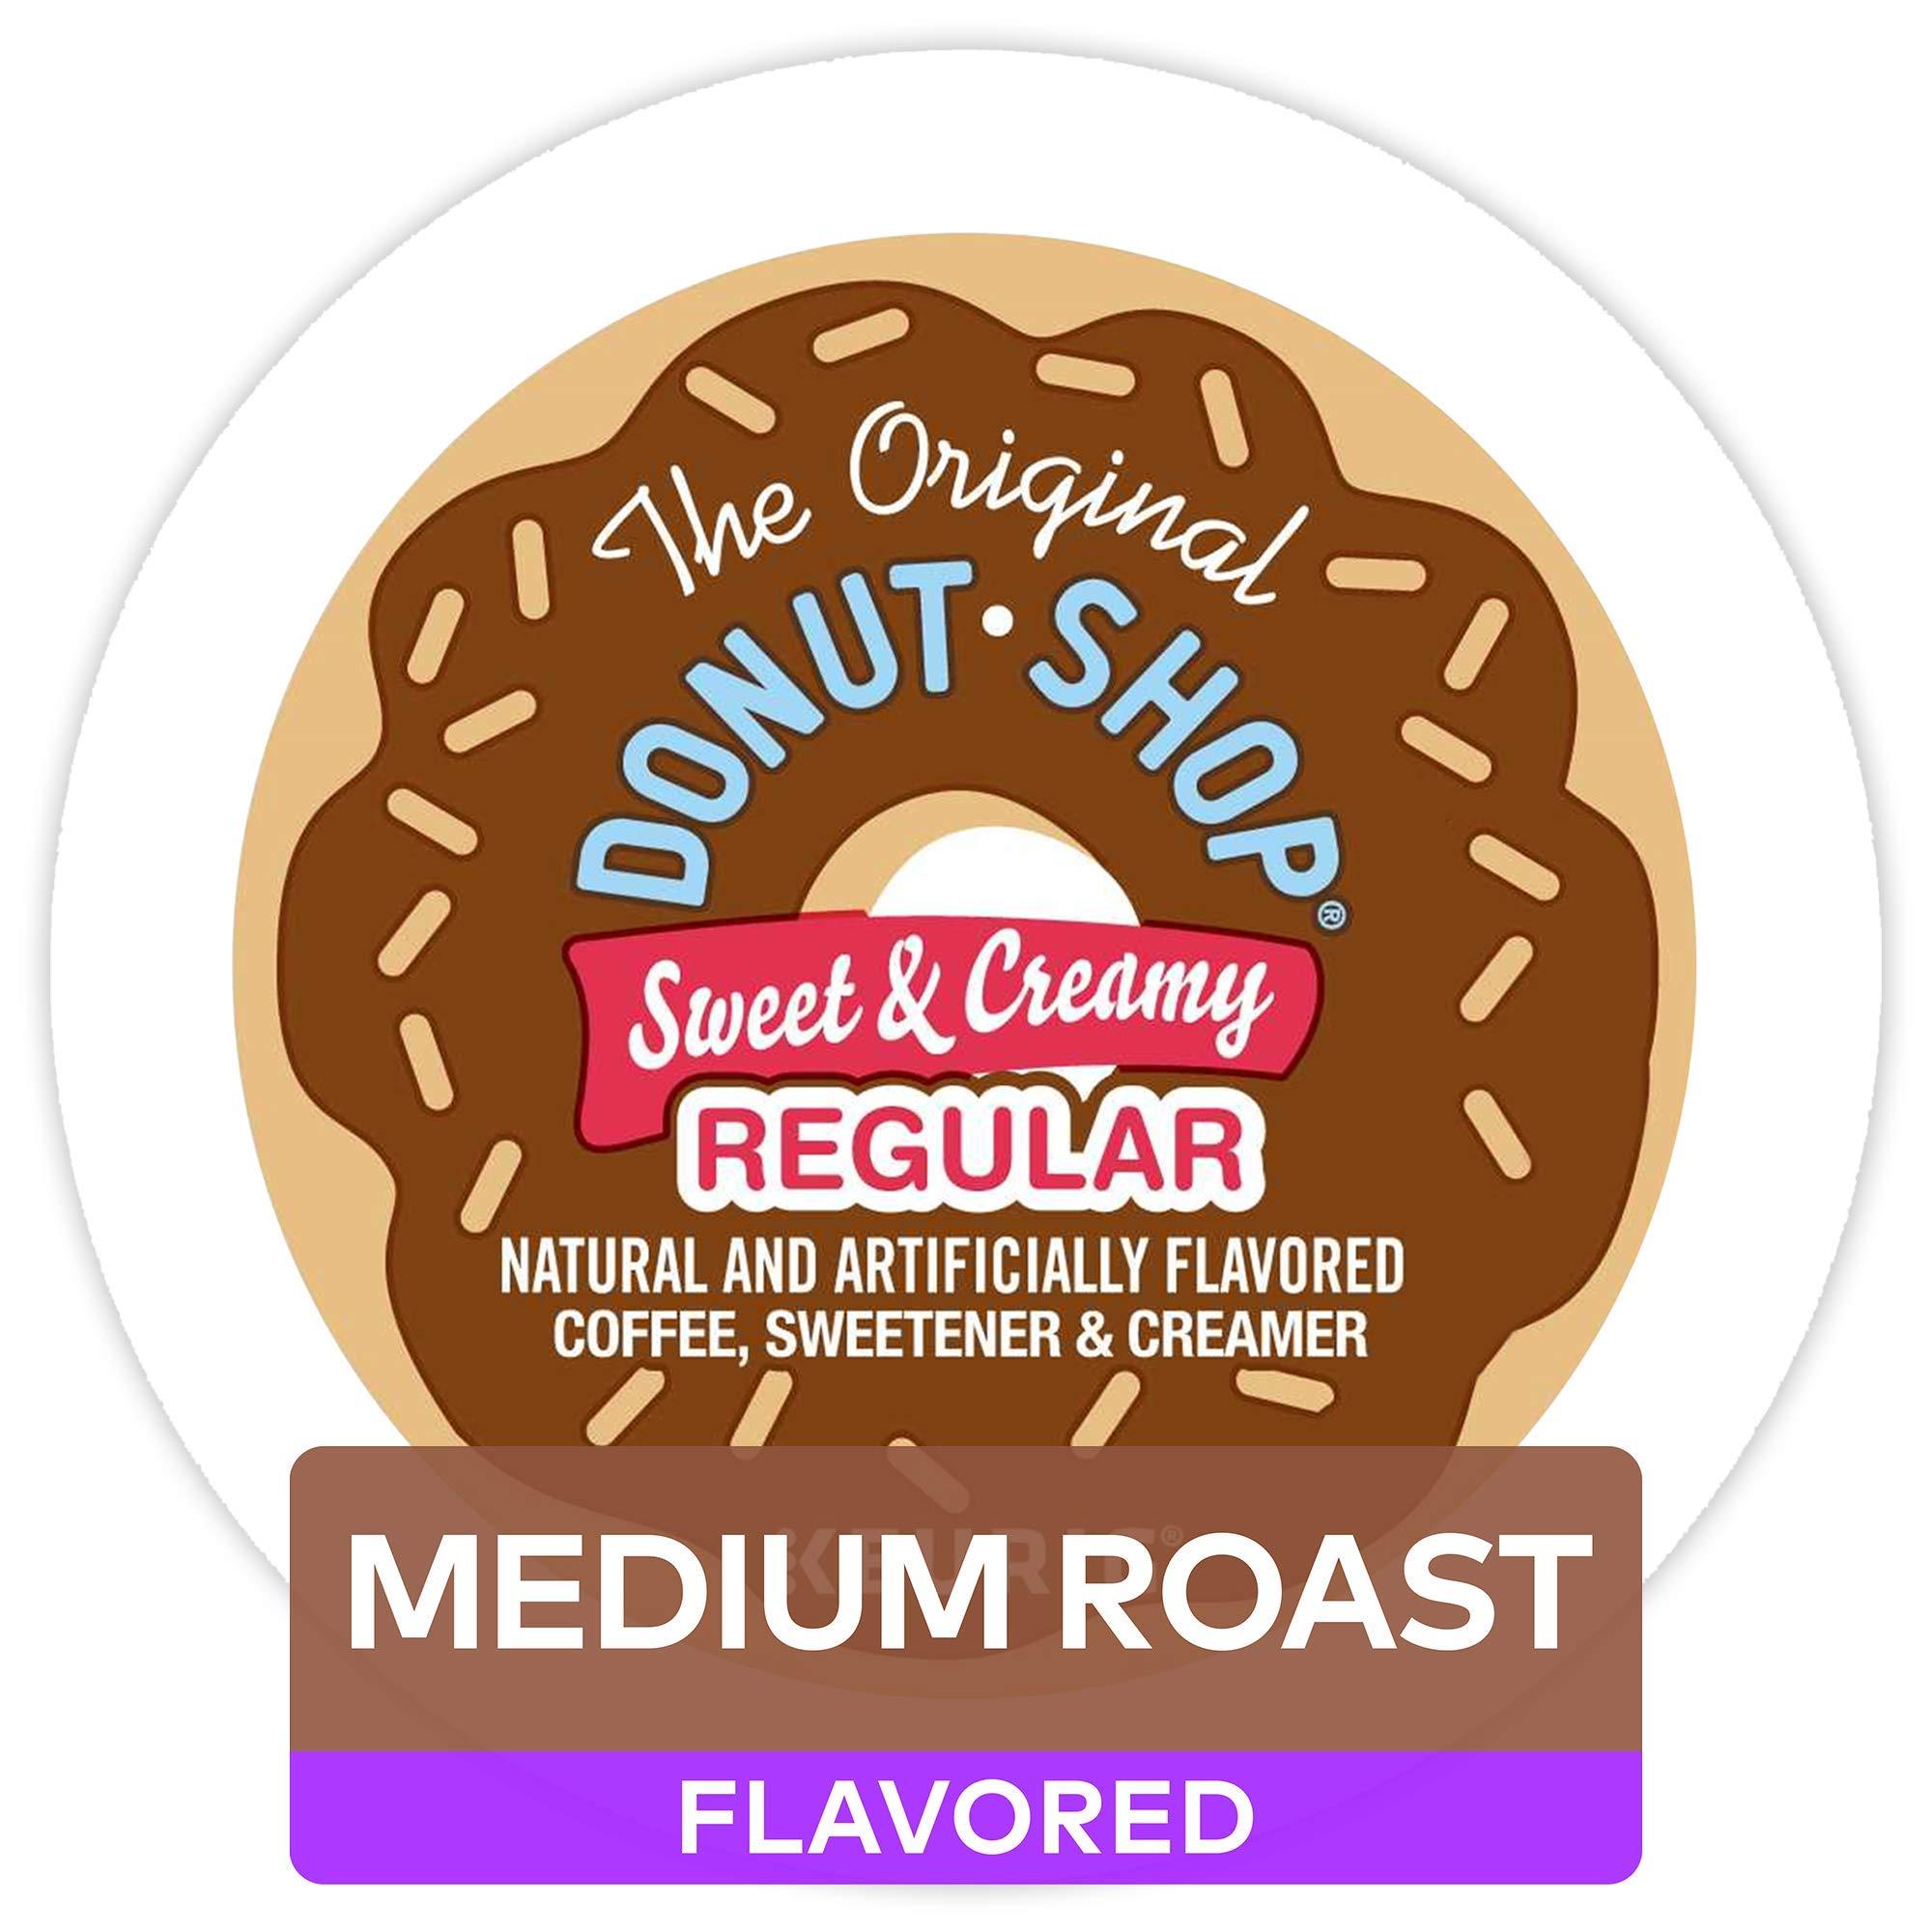 The Original Donut Shop Keurig Single-Serve K-Cup Pods, Medium Roast Coffee, 60 count